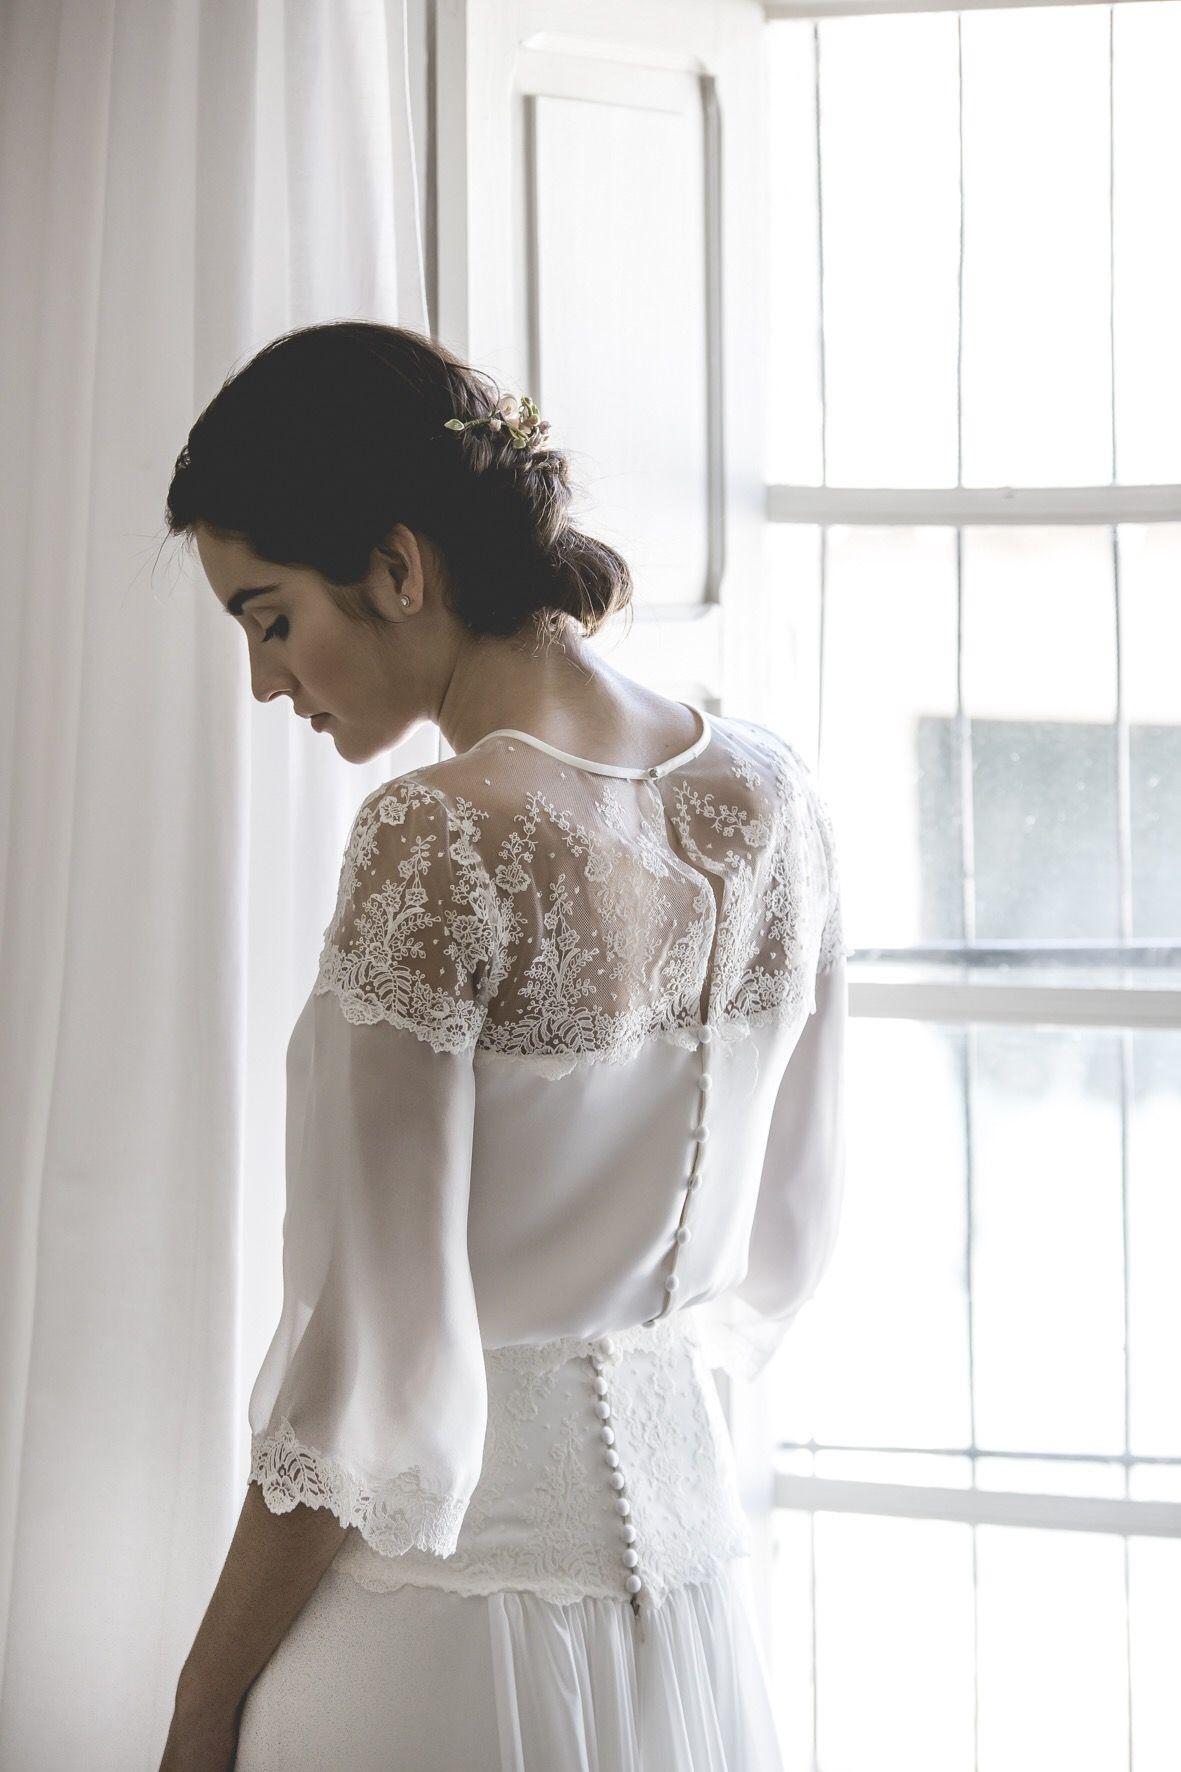 Vestido de novia de muselina de seda y encaje bordado. Wedding dress. Silk. Alejandra Svarc. Tocado Mimoki